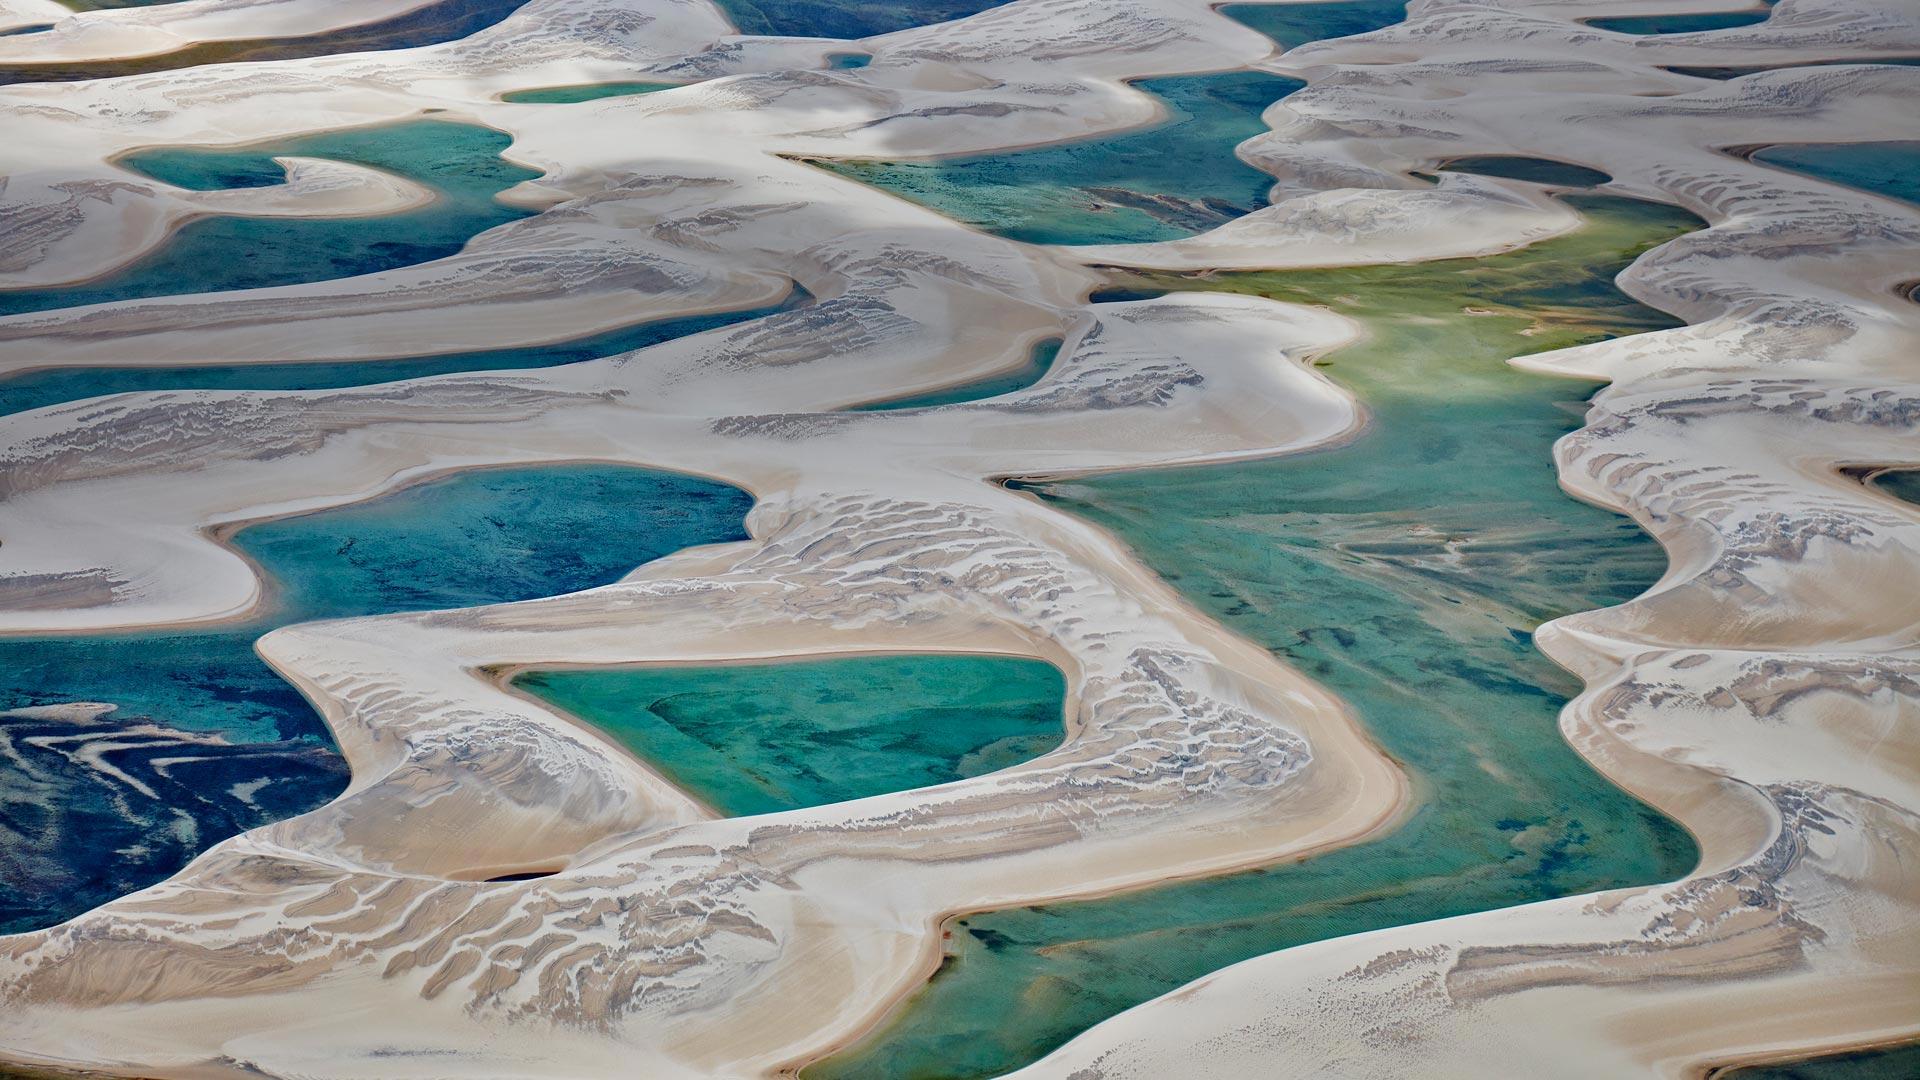 Lenis Maranhenses National Park Bing Wallpaper Download 1920x1080